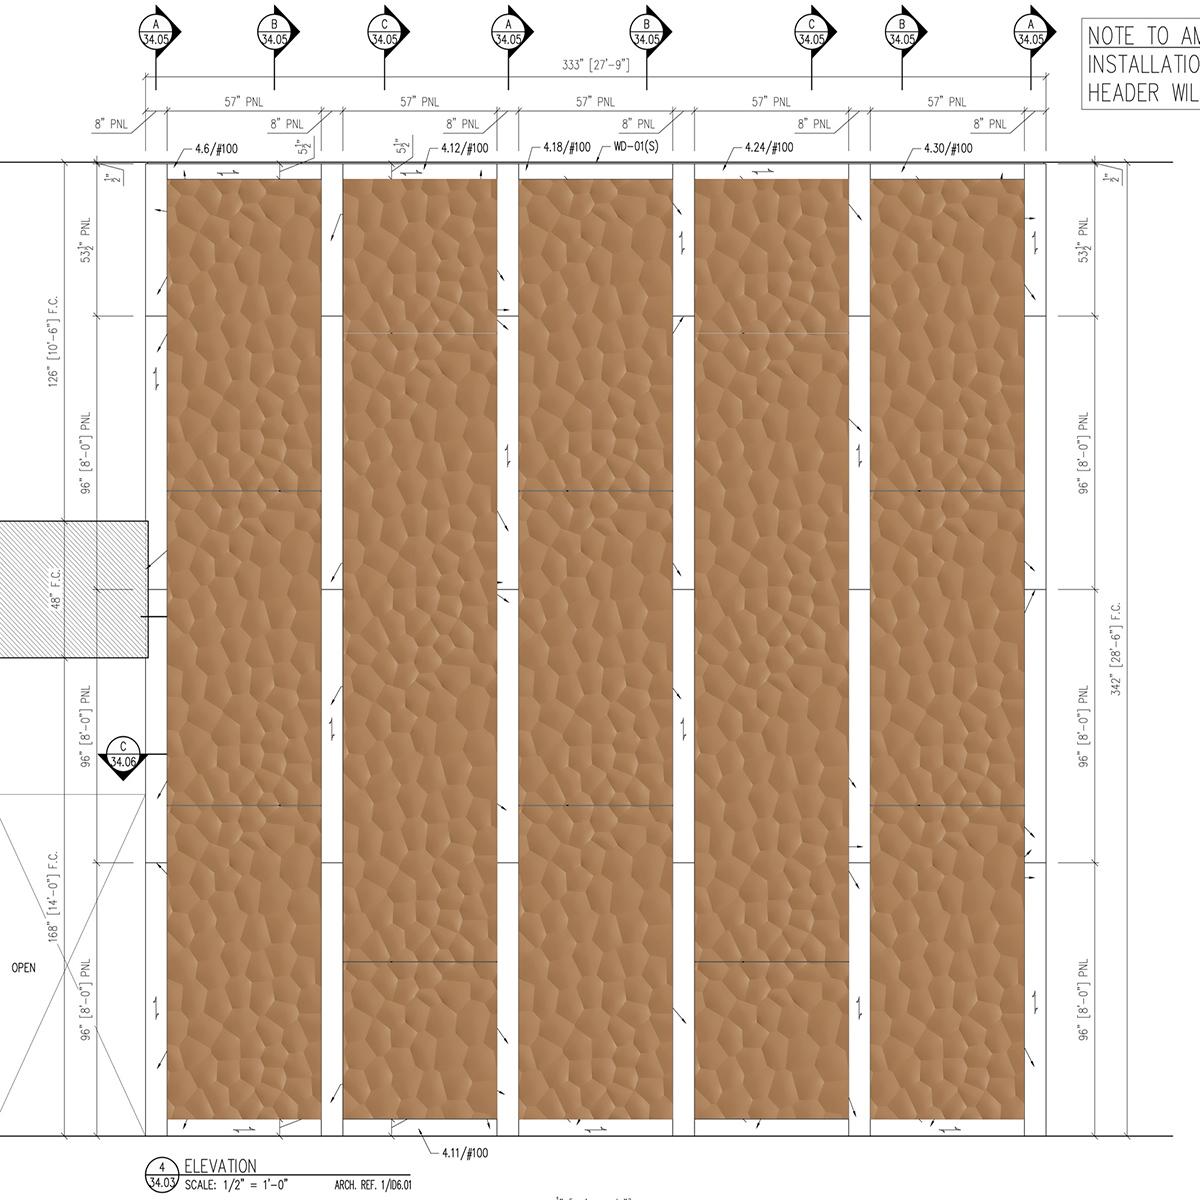 1009_LobbyFeatureWall-CarvedPanelLayout-R.jpg